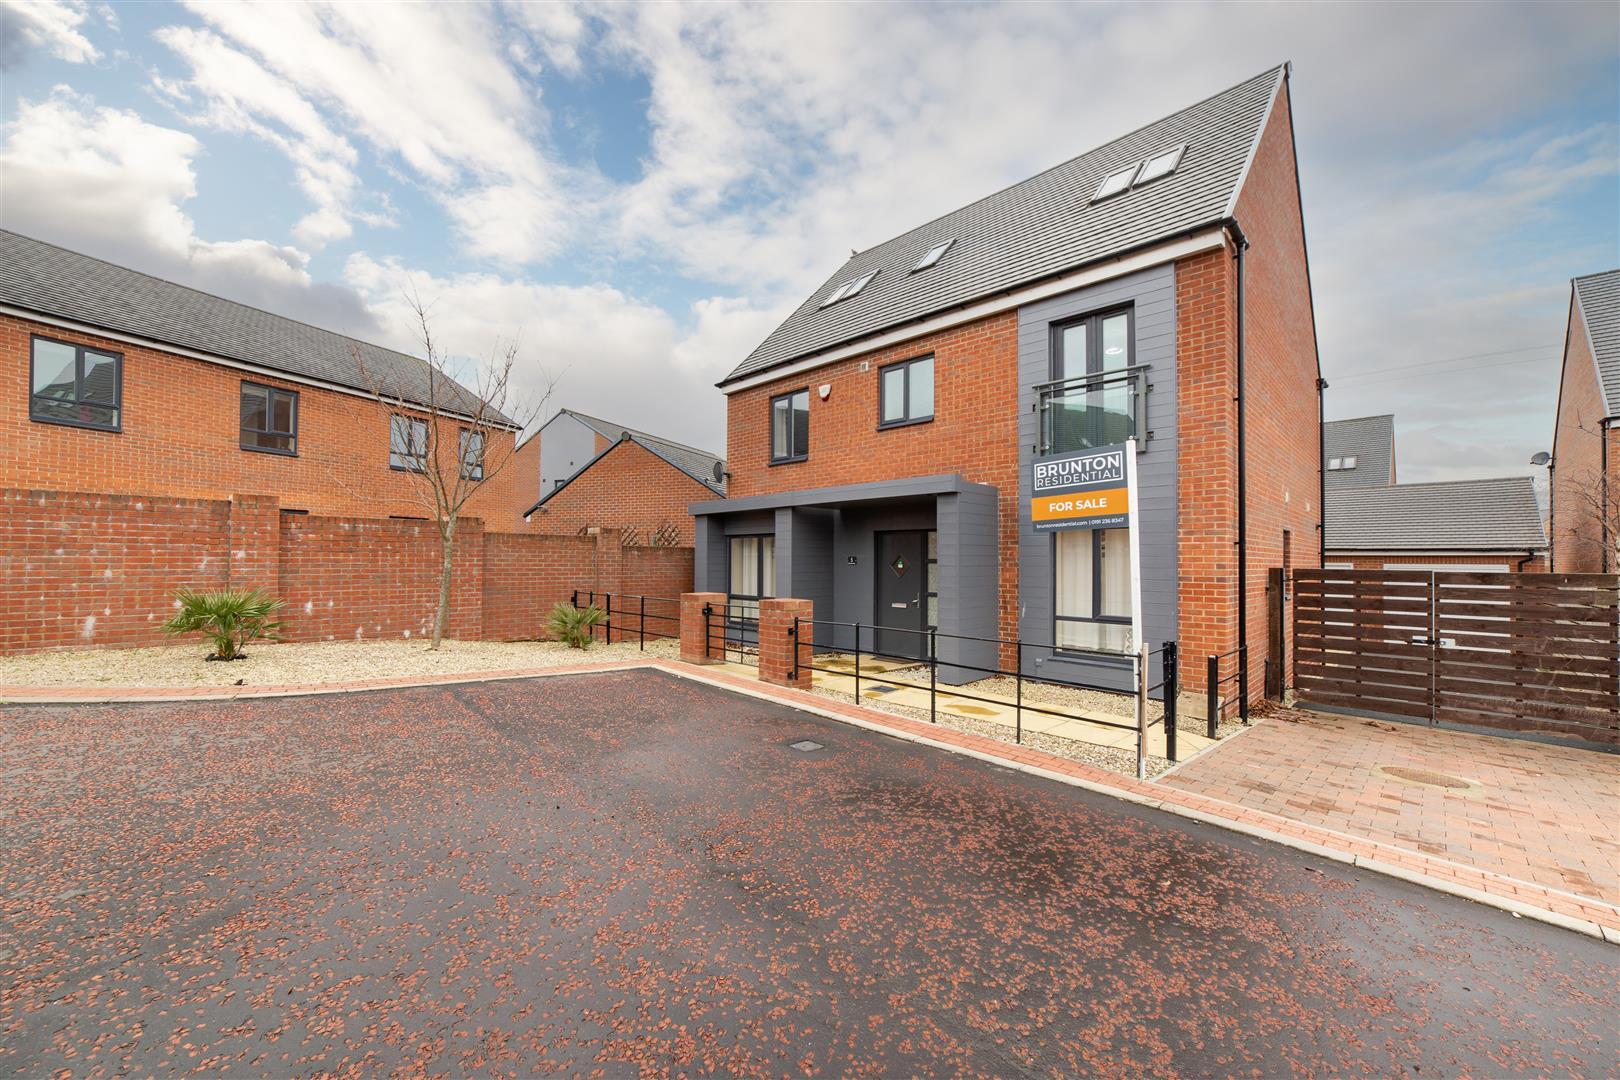 6 bed detached house for sale in Warenton Way, Great Park, NE13